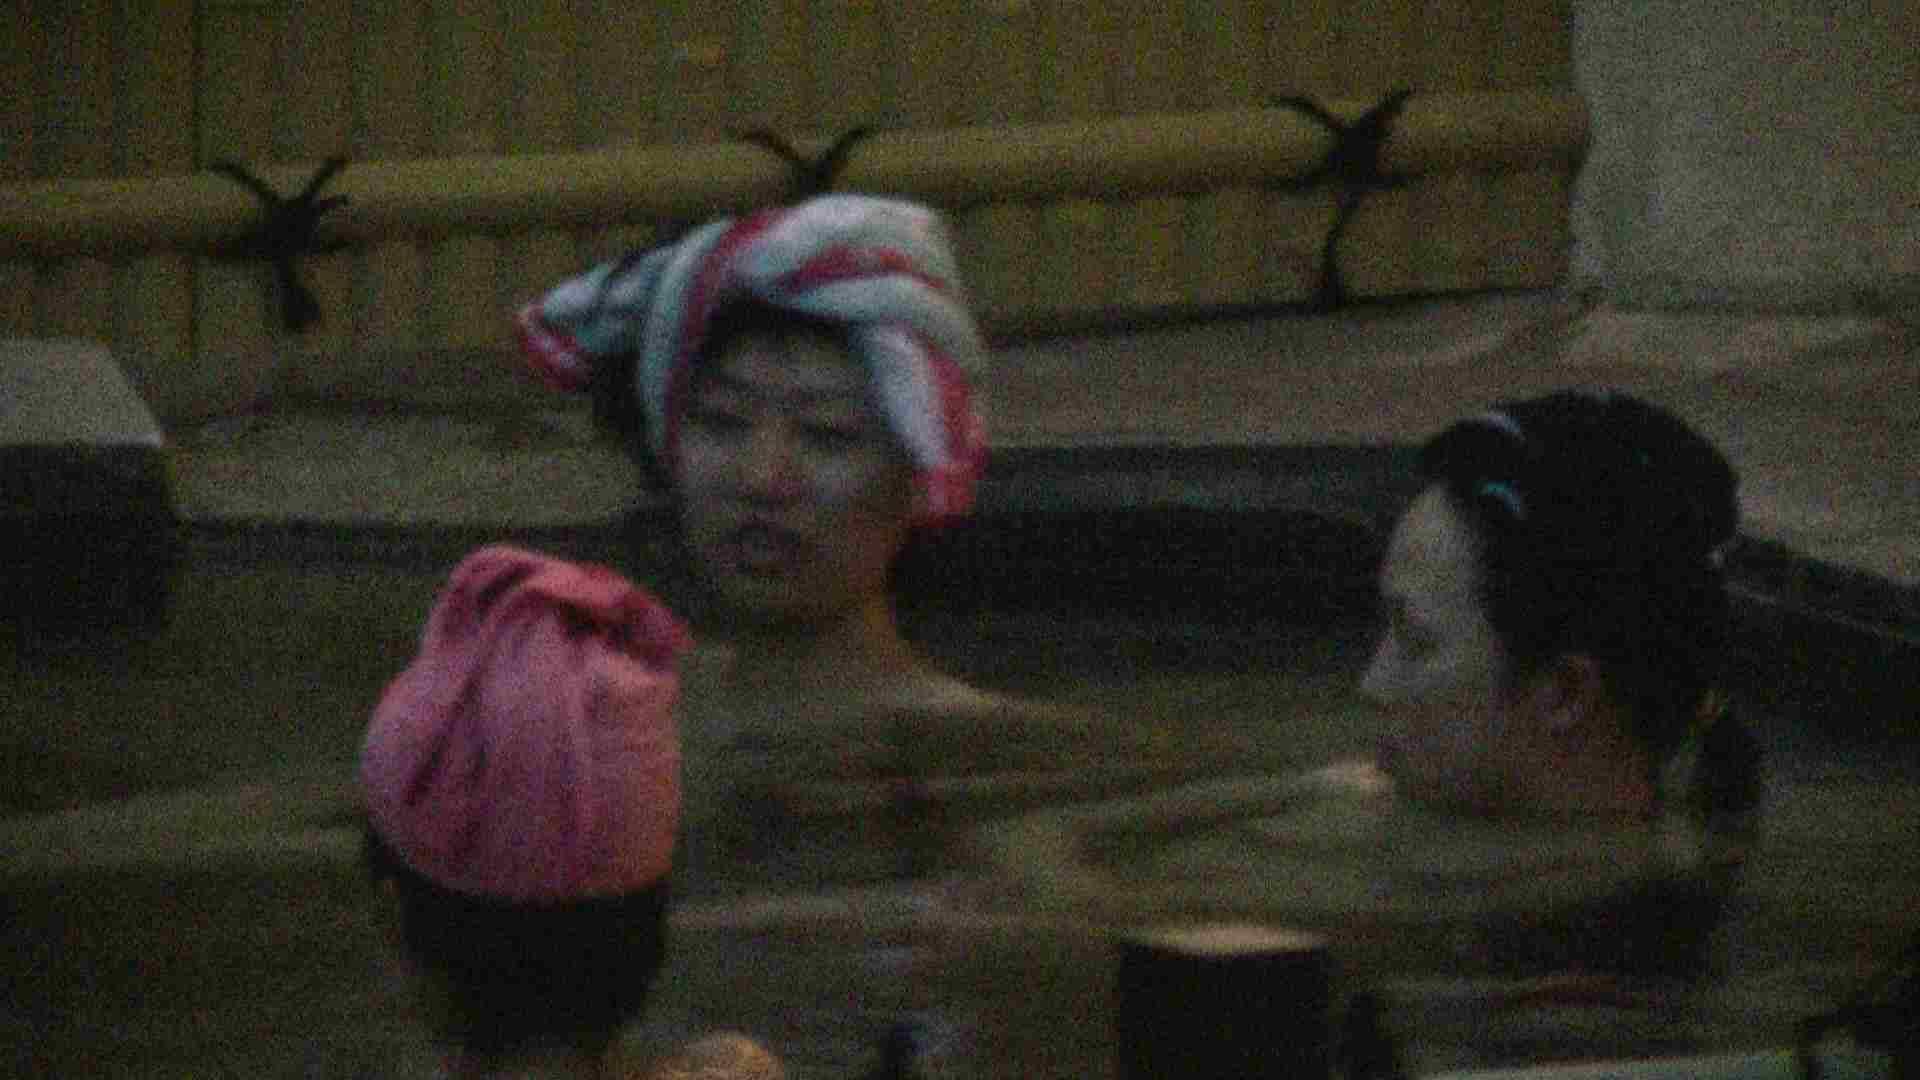 Aquaな露天風呂Vol.149 露天風呂突入 オマンコ動画キャプチャ 101pic 89